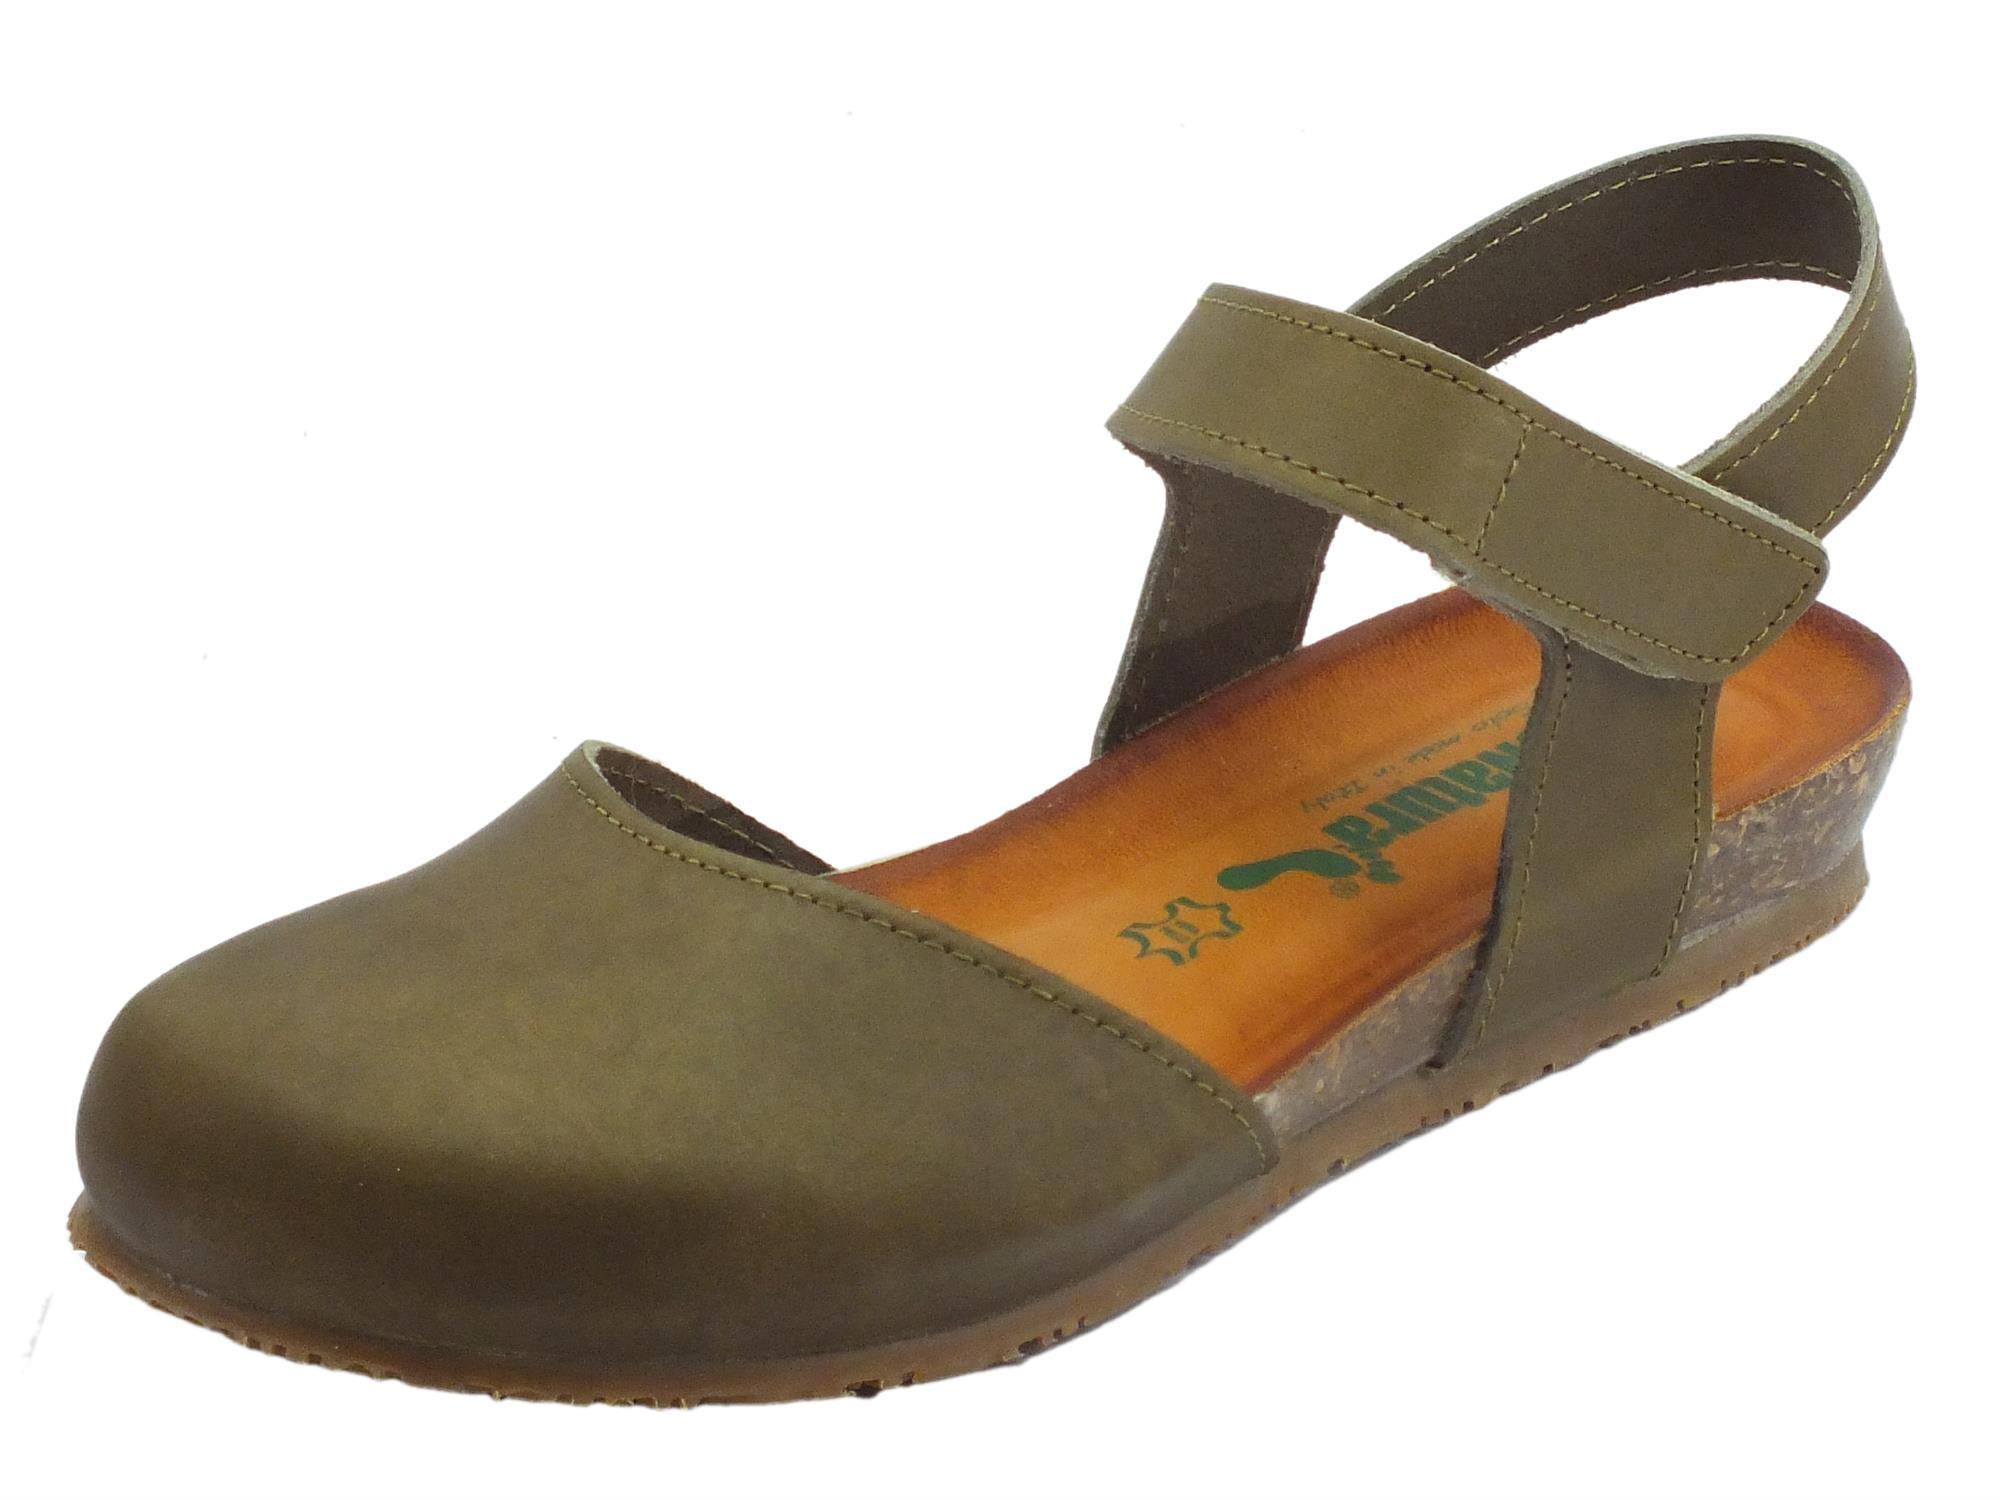 finest selection 71b21 03b5c BioNatura 68 C 2081 IMB Pelle Gaucho Fango sandali chiusi in pelle zeppa  bassa